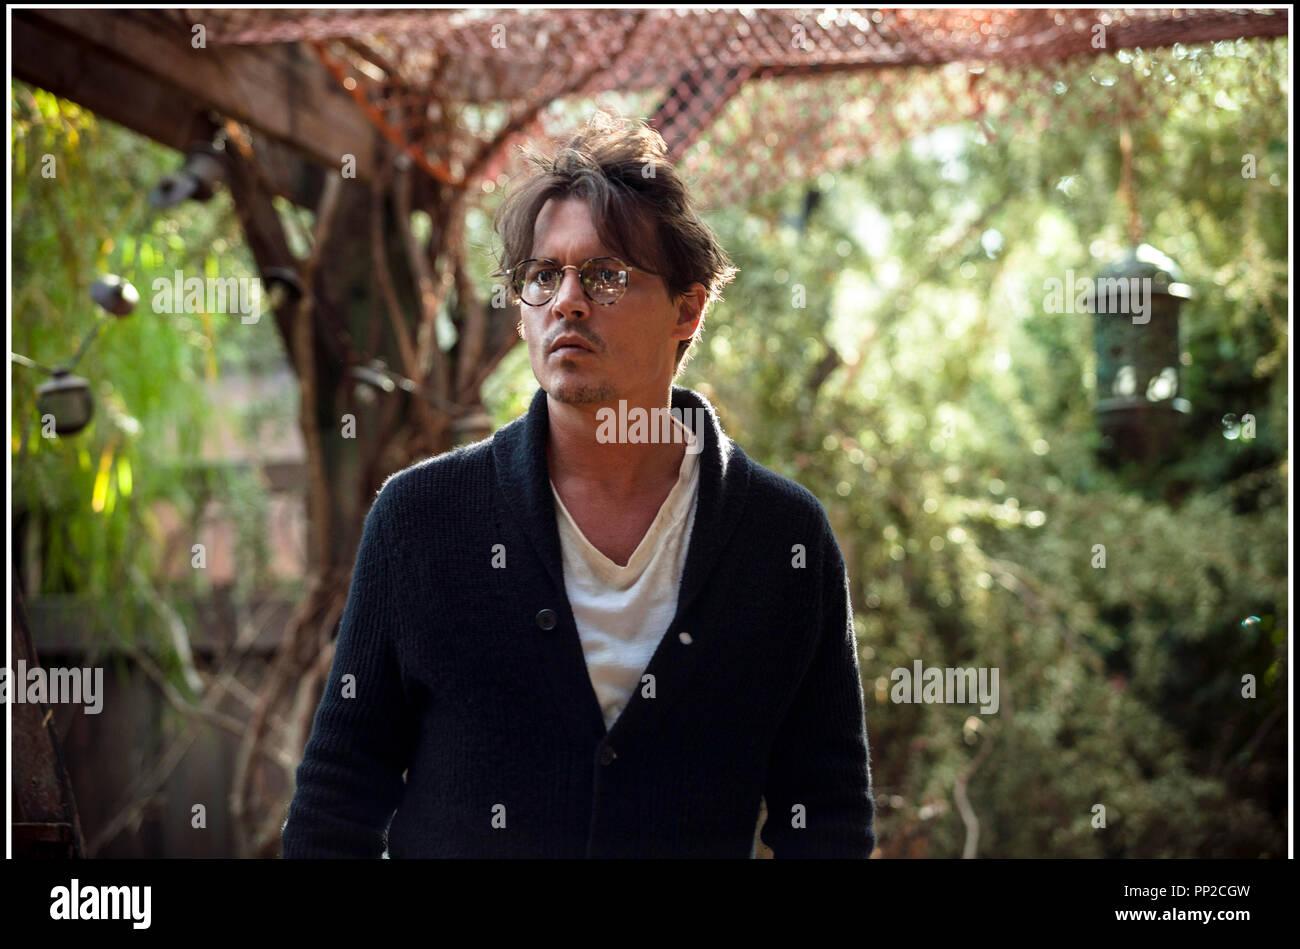 Prod DB © Alcon Entertainment - DMG Entertainment - Syncopy - Straight Up Films / DR TRANSCENDANCE (TRANSCENDENCE) de Wally Pfister 2014 GB/CHIN./USA avec Johnny Depp - Stock Image